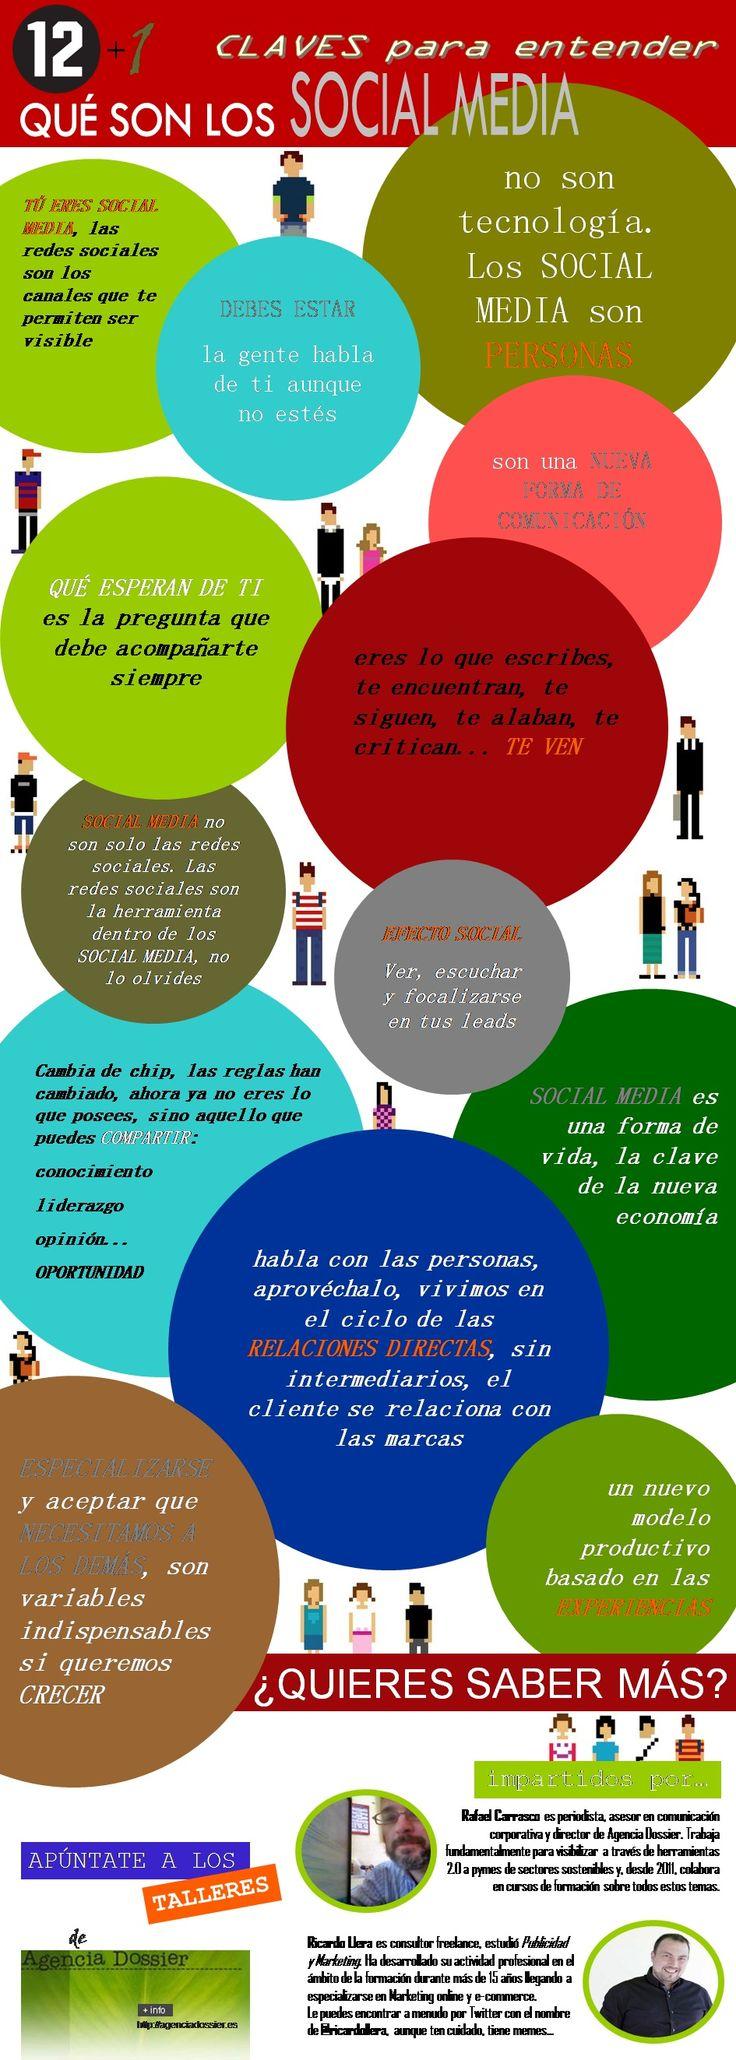 12+1 claves para entender qué son los #socialmedia #infografia (pinned by @ricardollera)